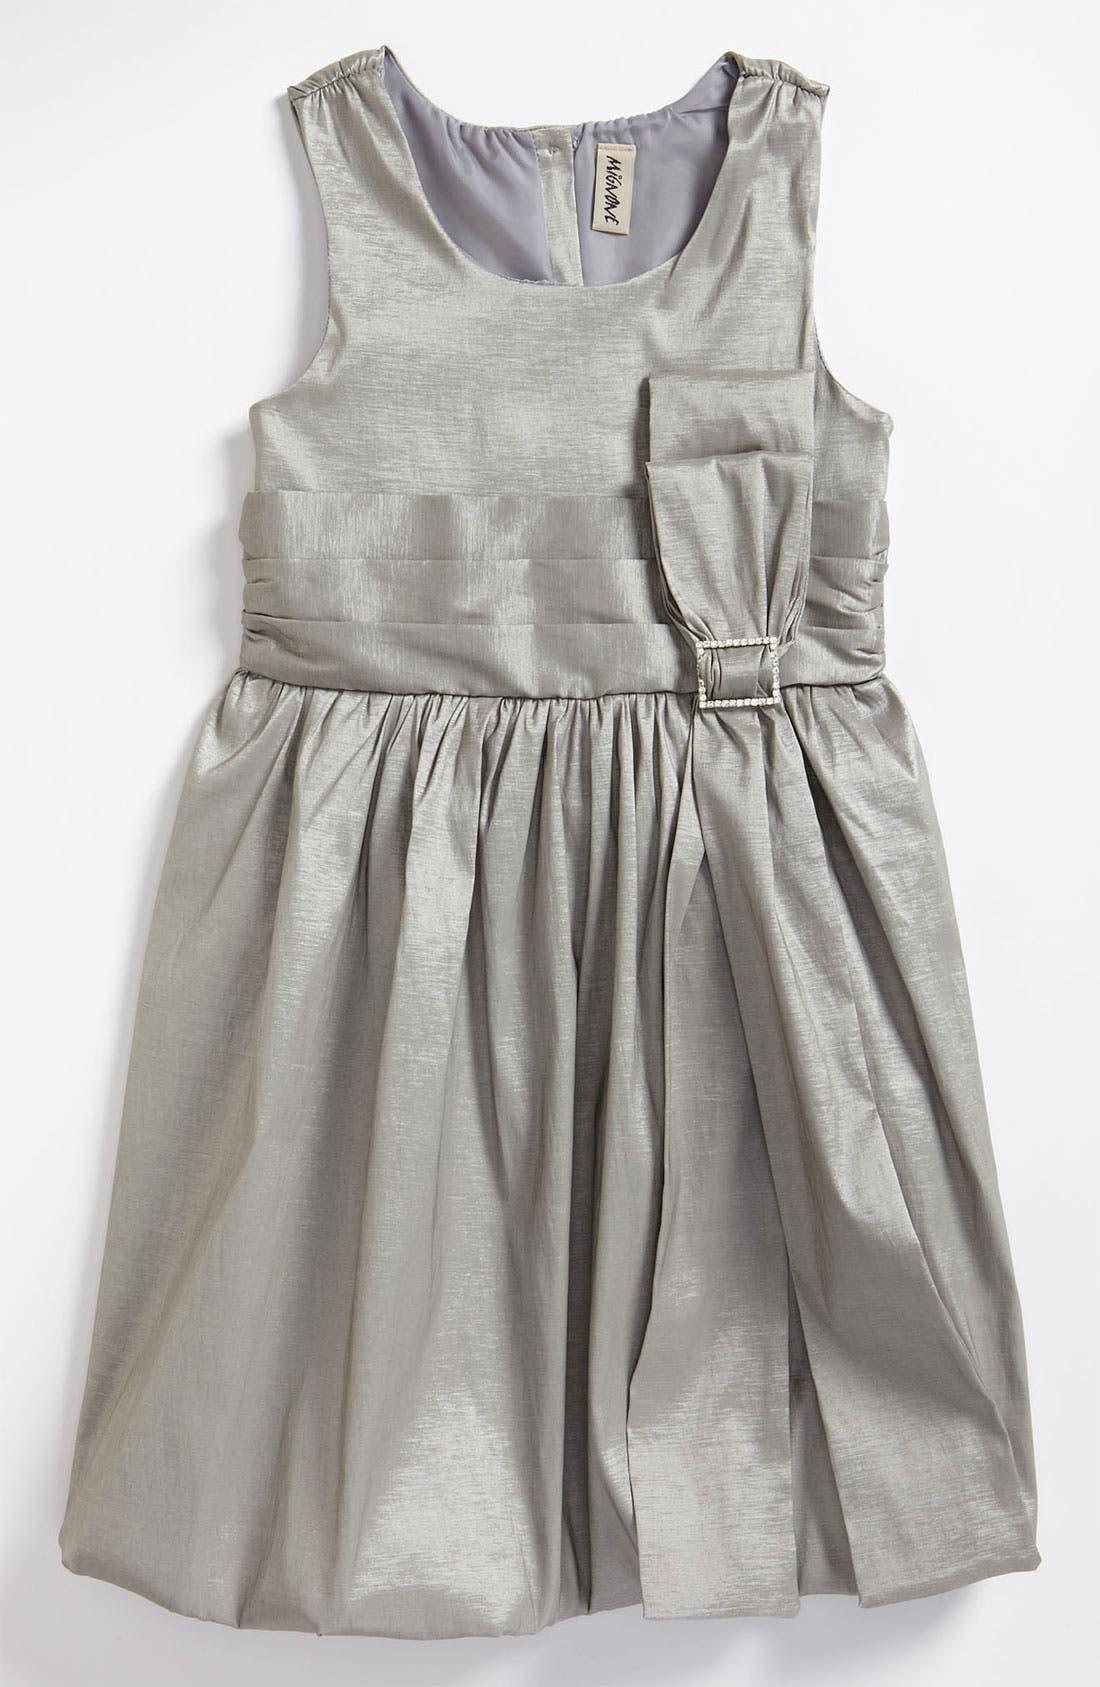 Alternate Image 1 Selected - Mignone Taffeta Dress (Little Girls & Big Girls)